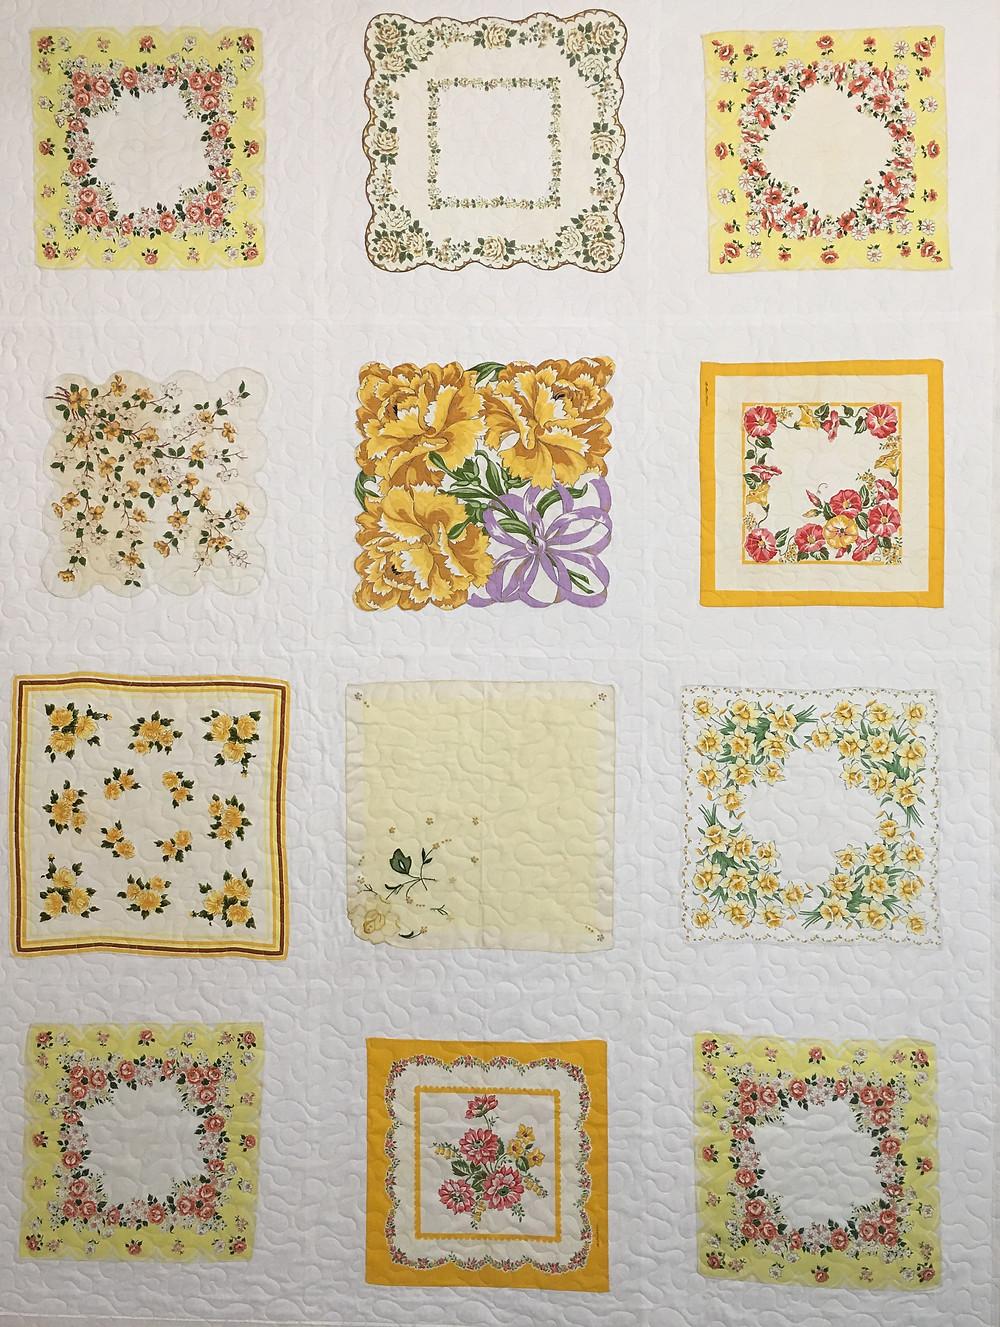 Appliqued Vintage Hankie Quilt by Susan Abram